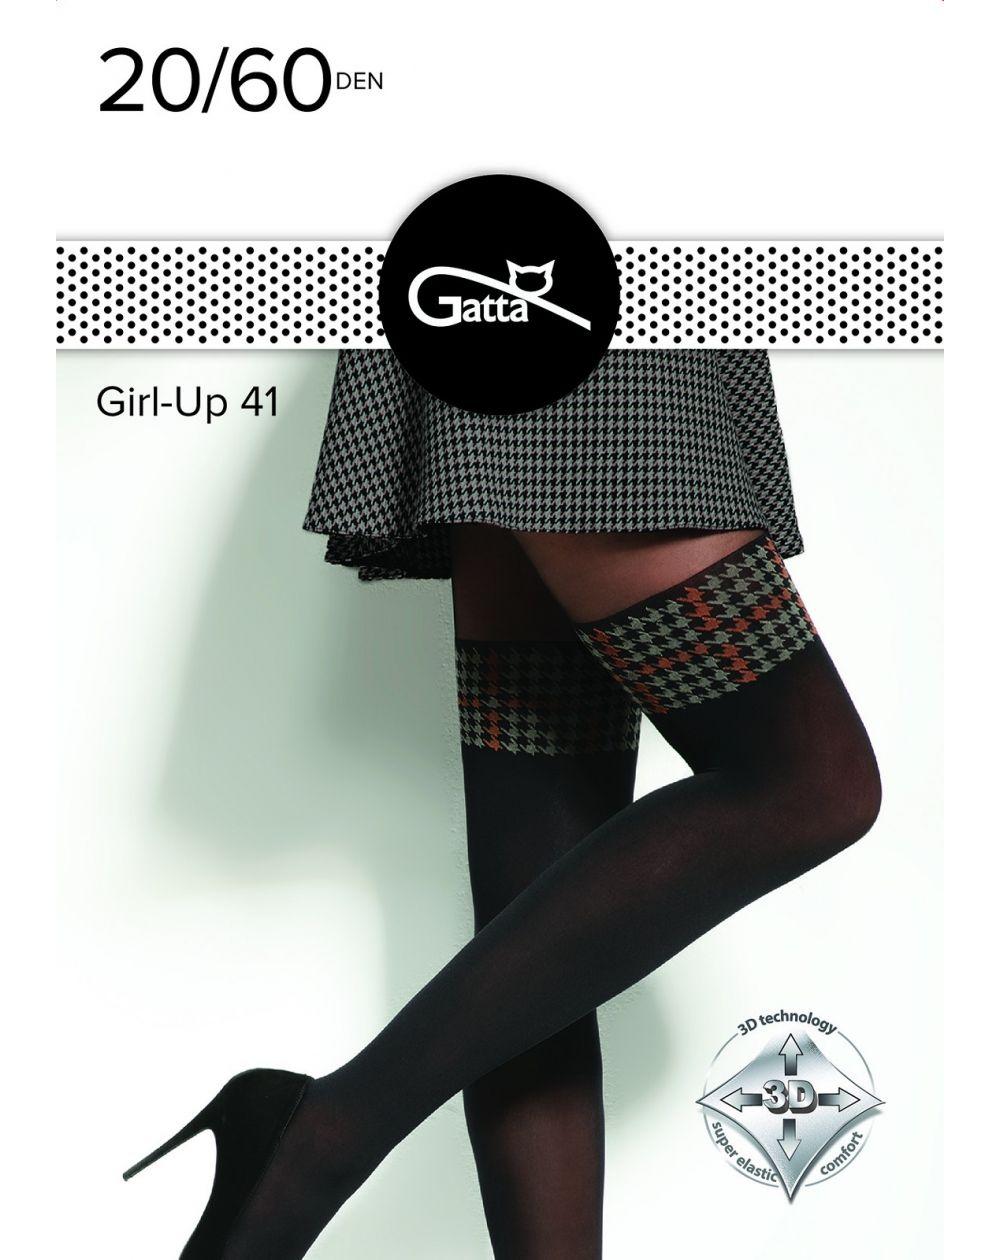 Rajstopy Gatta Girl-Up wz.41 20/60 den 2-4